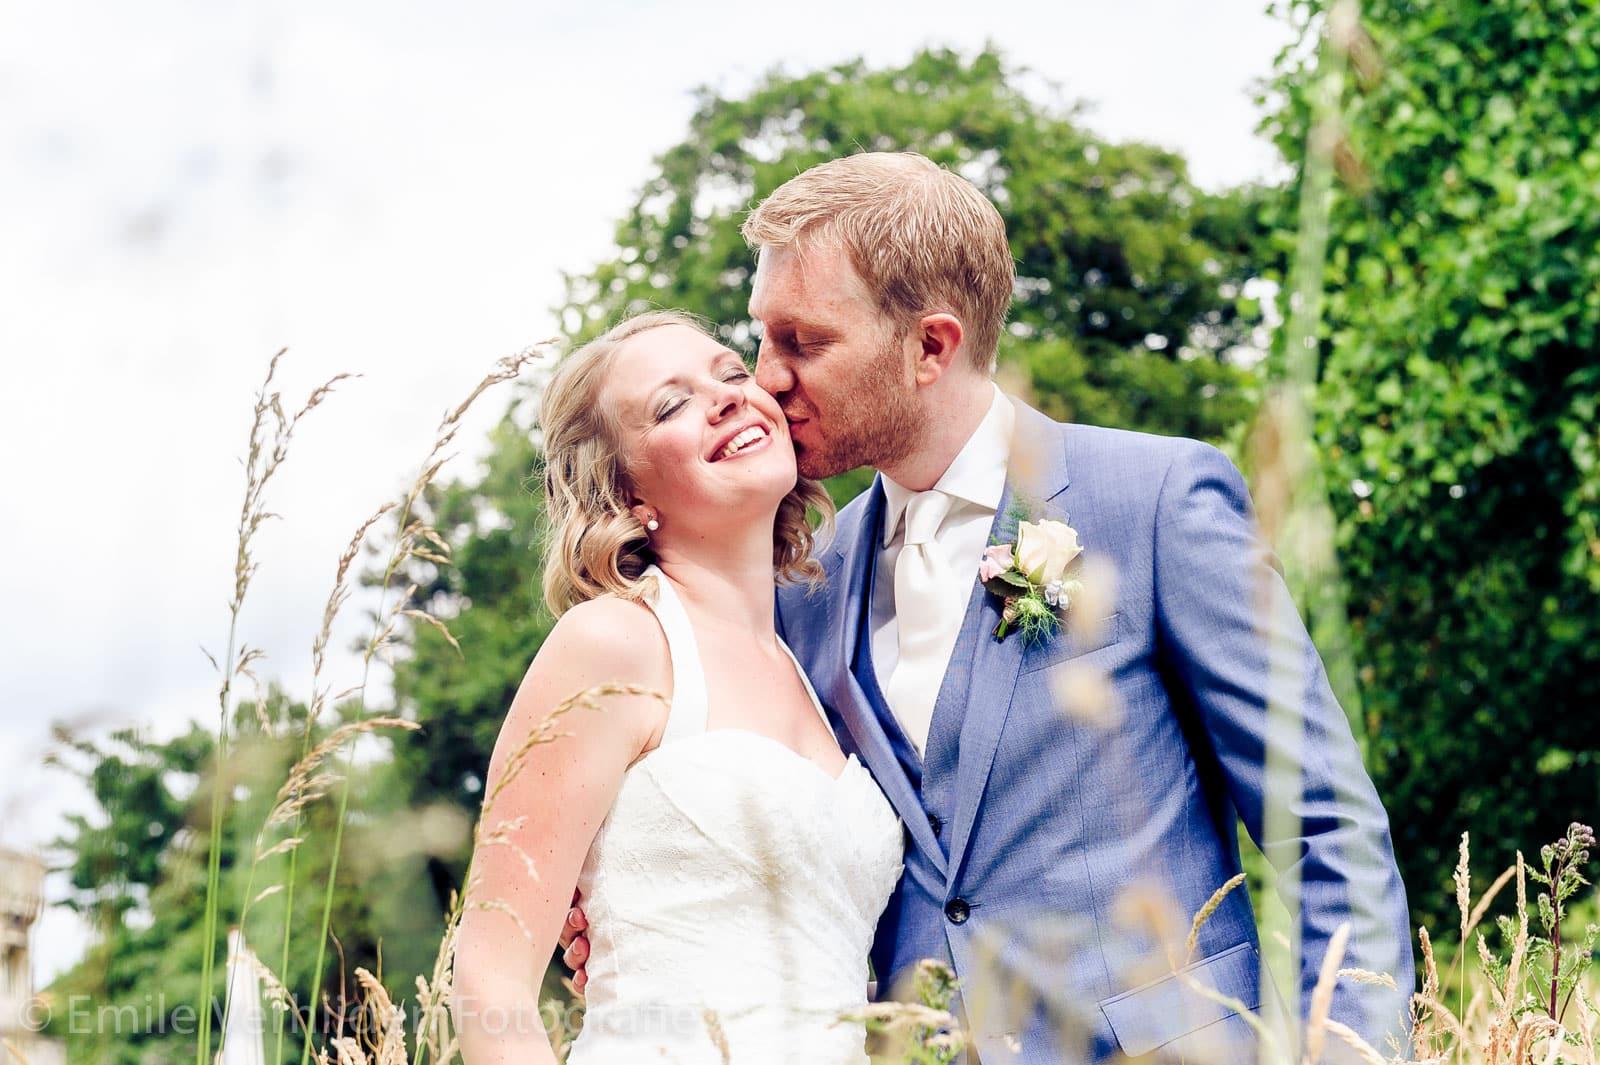 Stralende bruid tussen het gras